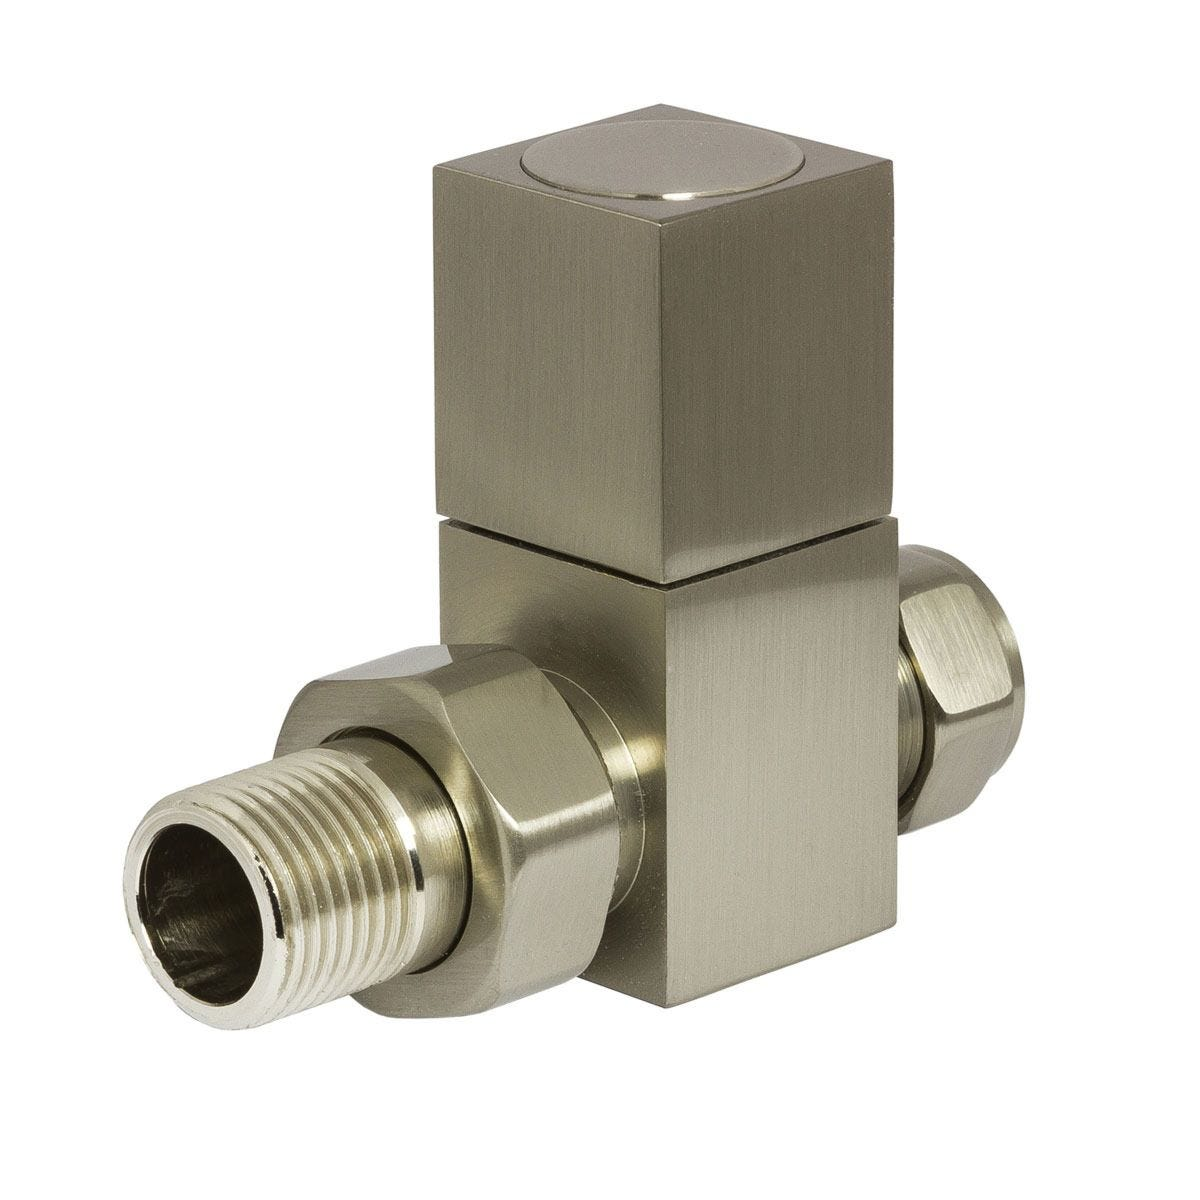 Heating Style Square Straight Radiator Valves - Bronze/Nikel